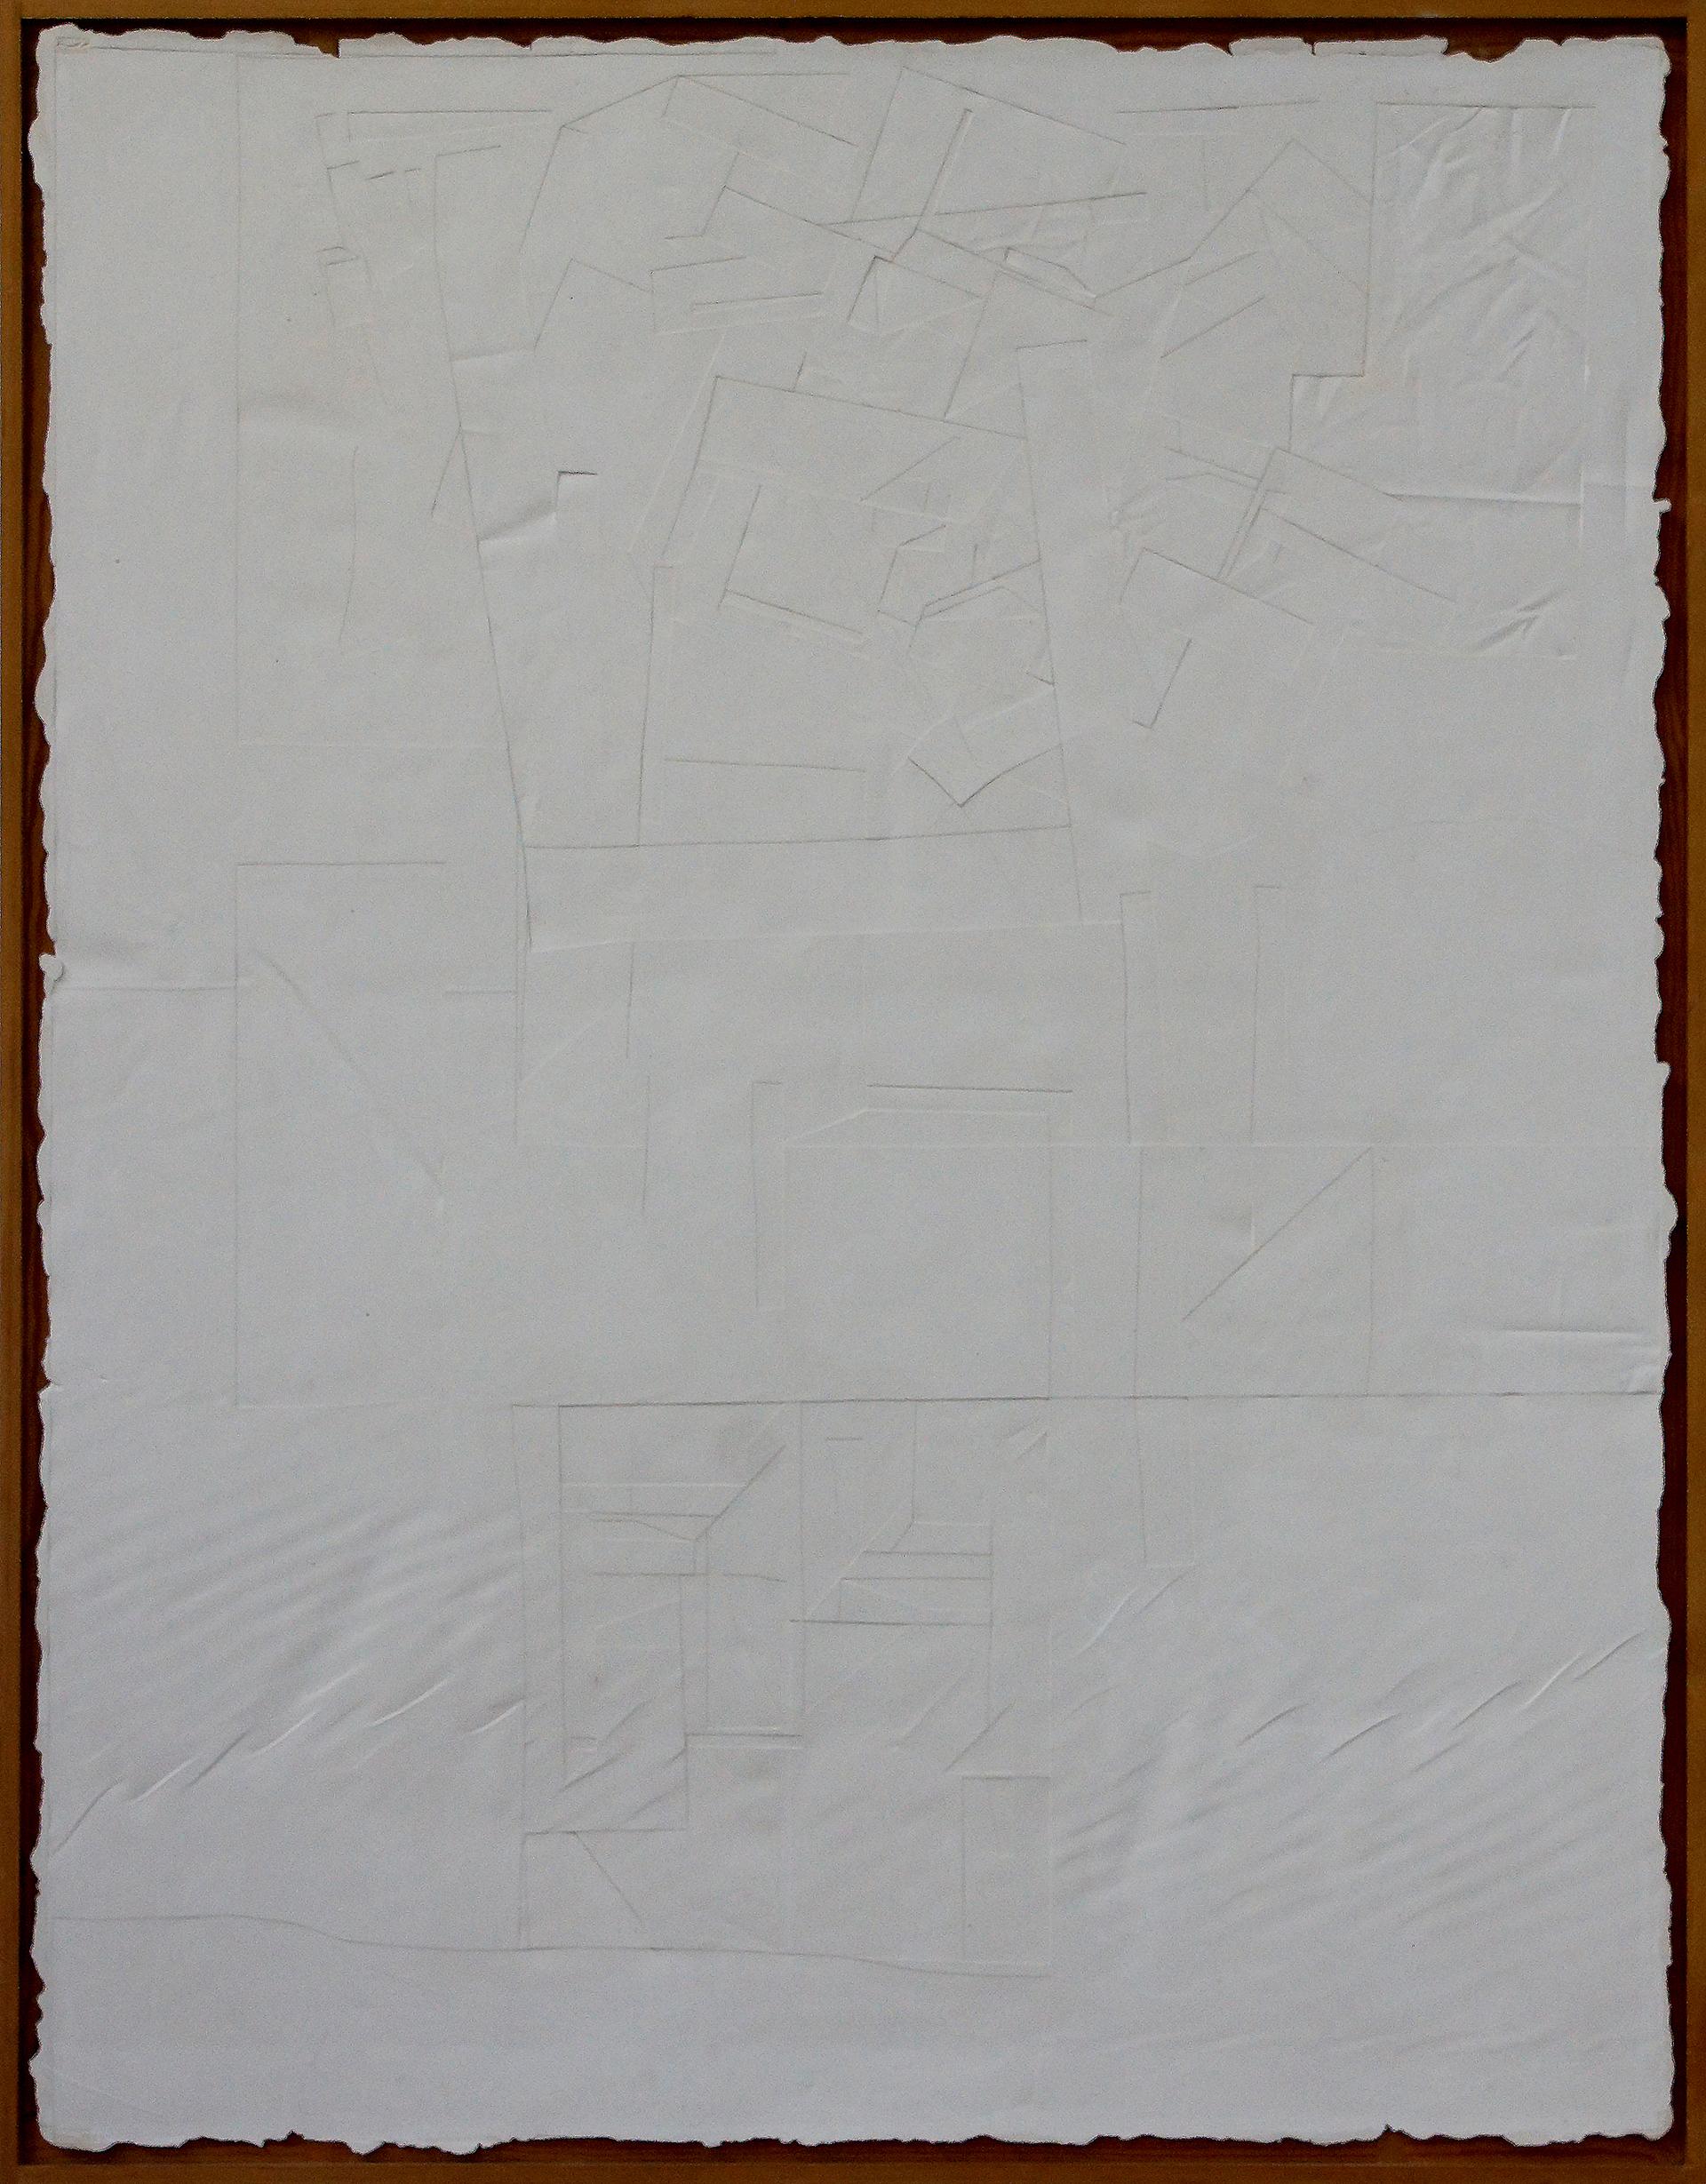 György Jovánovics: Relief (1982)